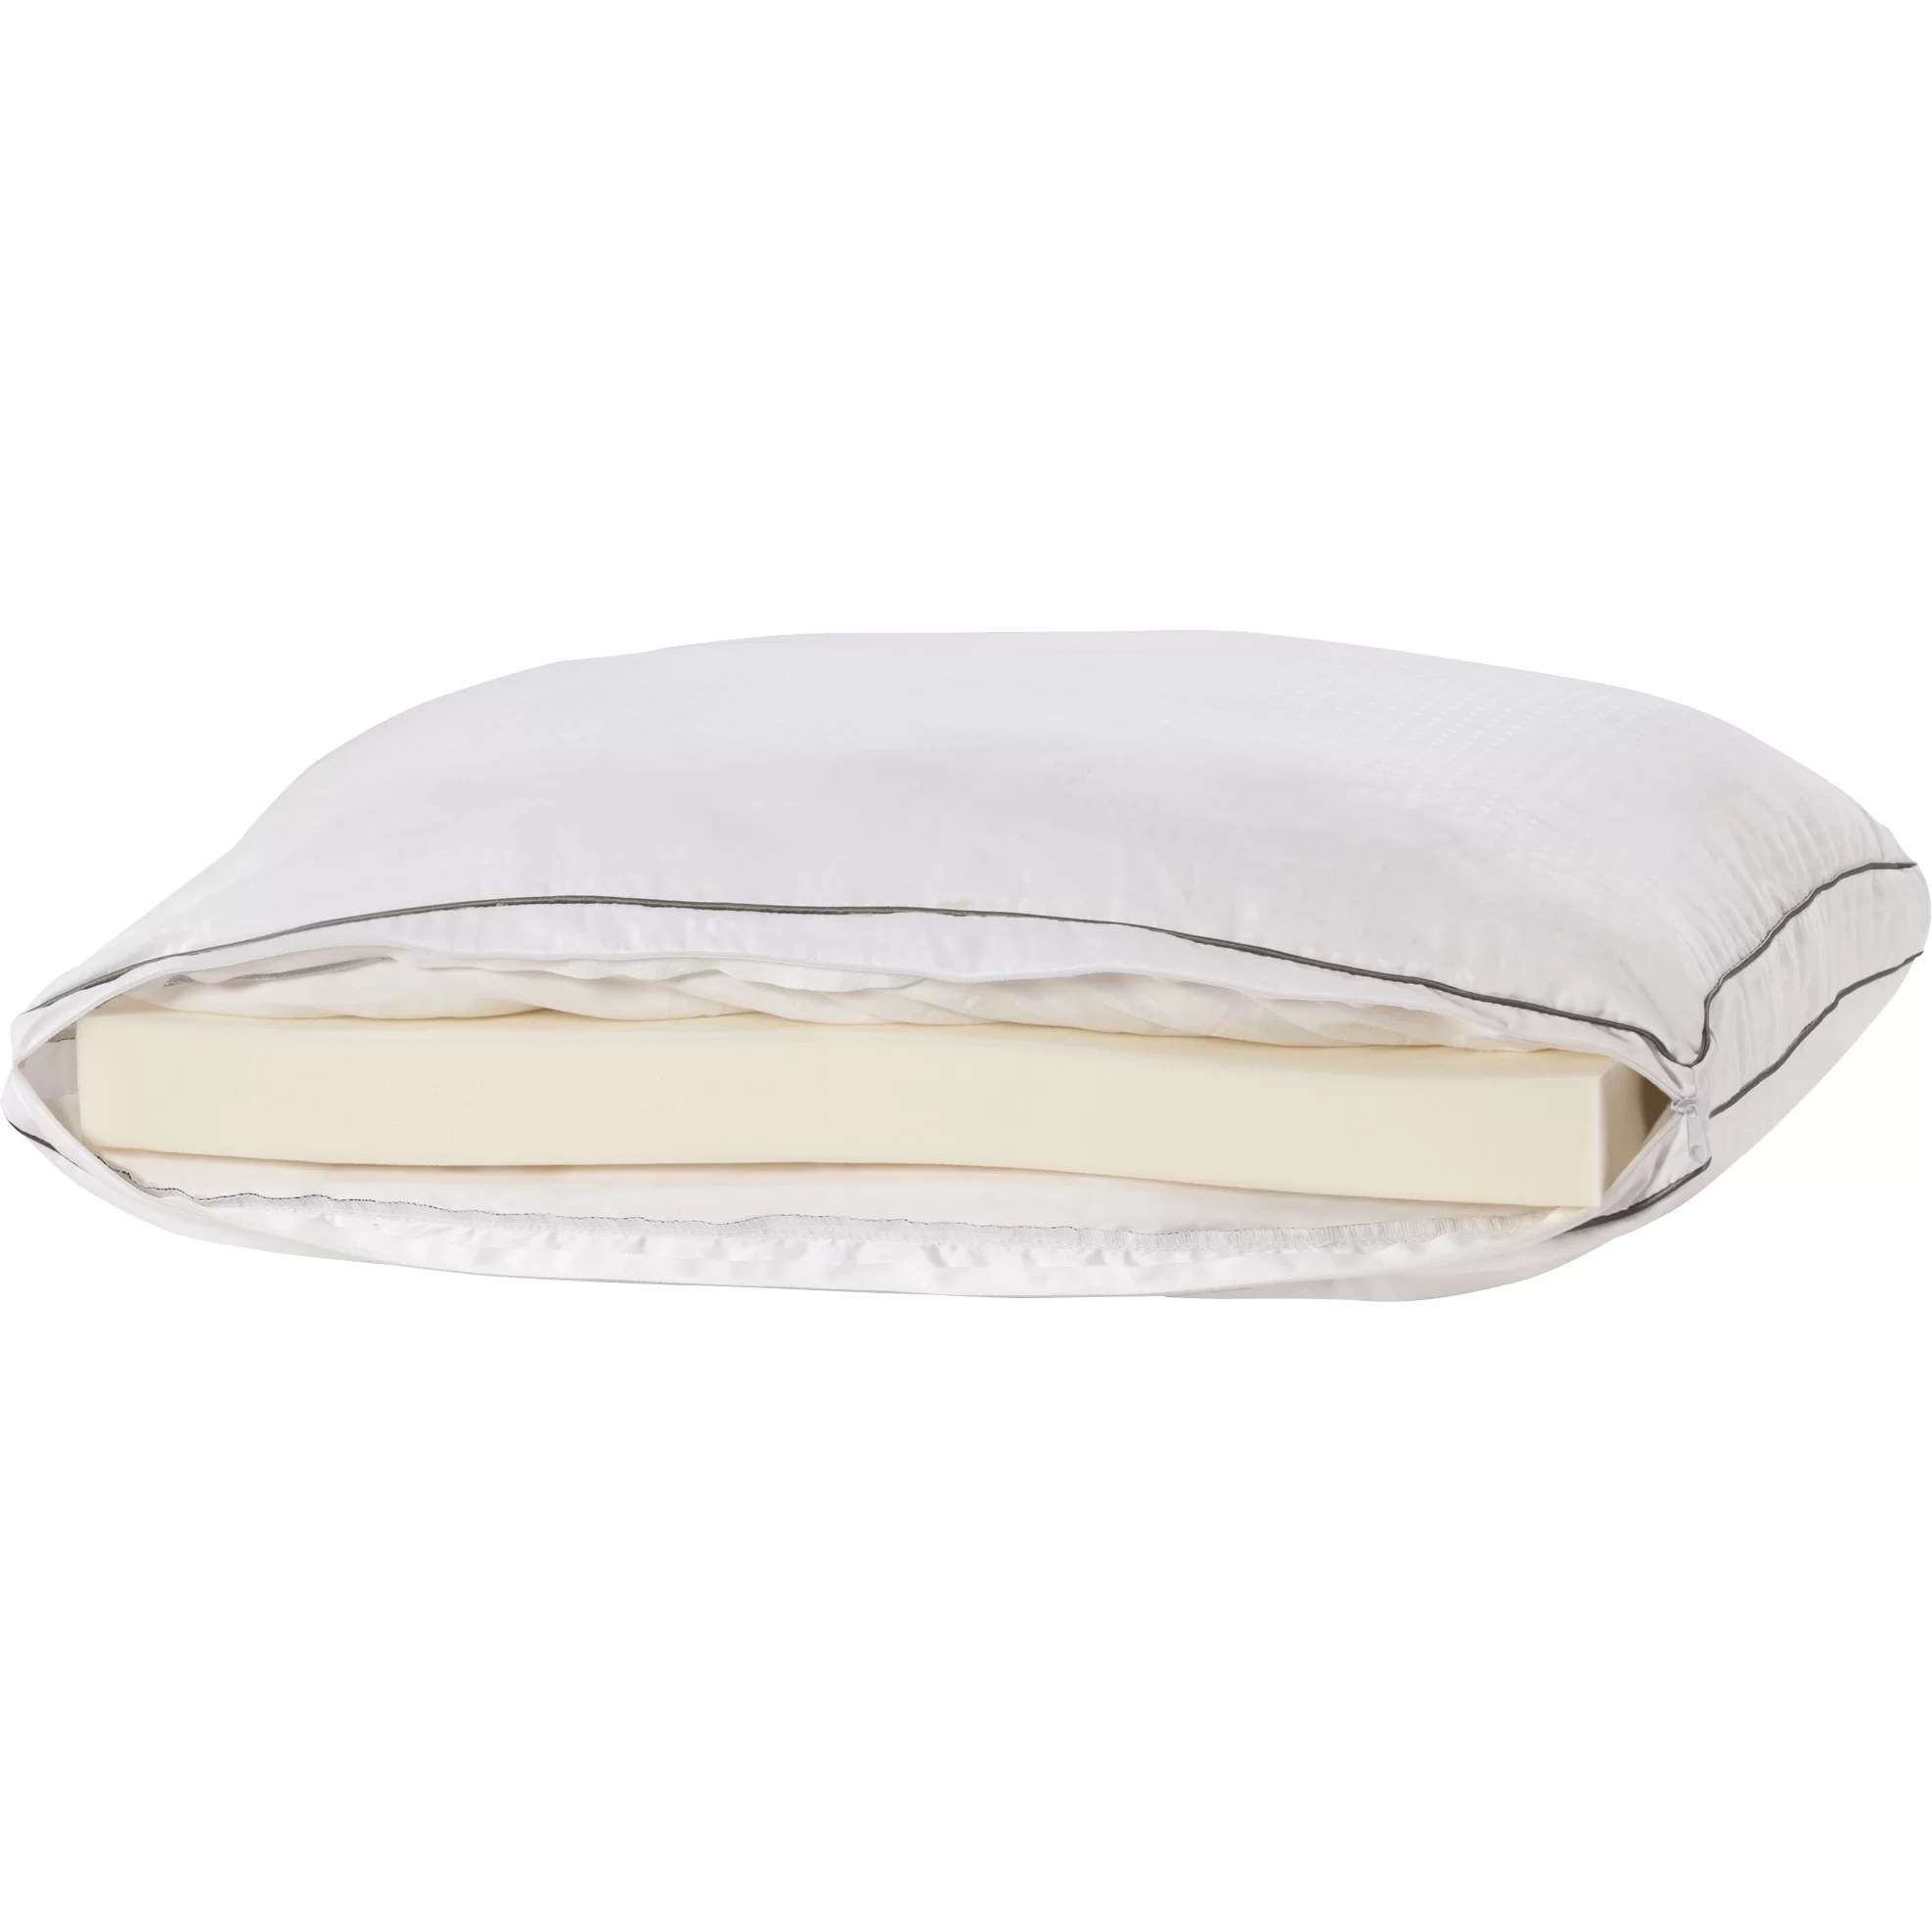 comfort dreams memory foam sofa sleeper mattress for free singapore revolution dreamfinity queen pillow